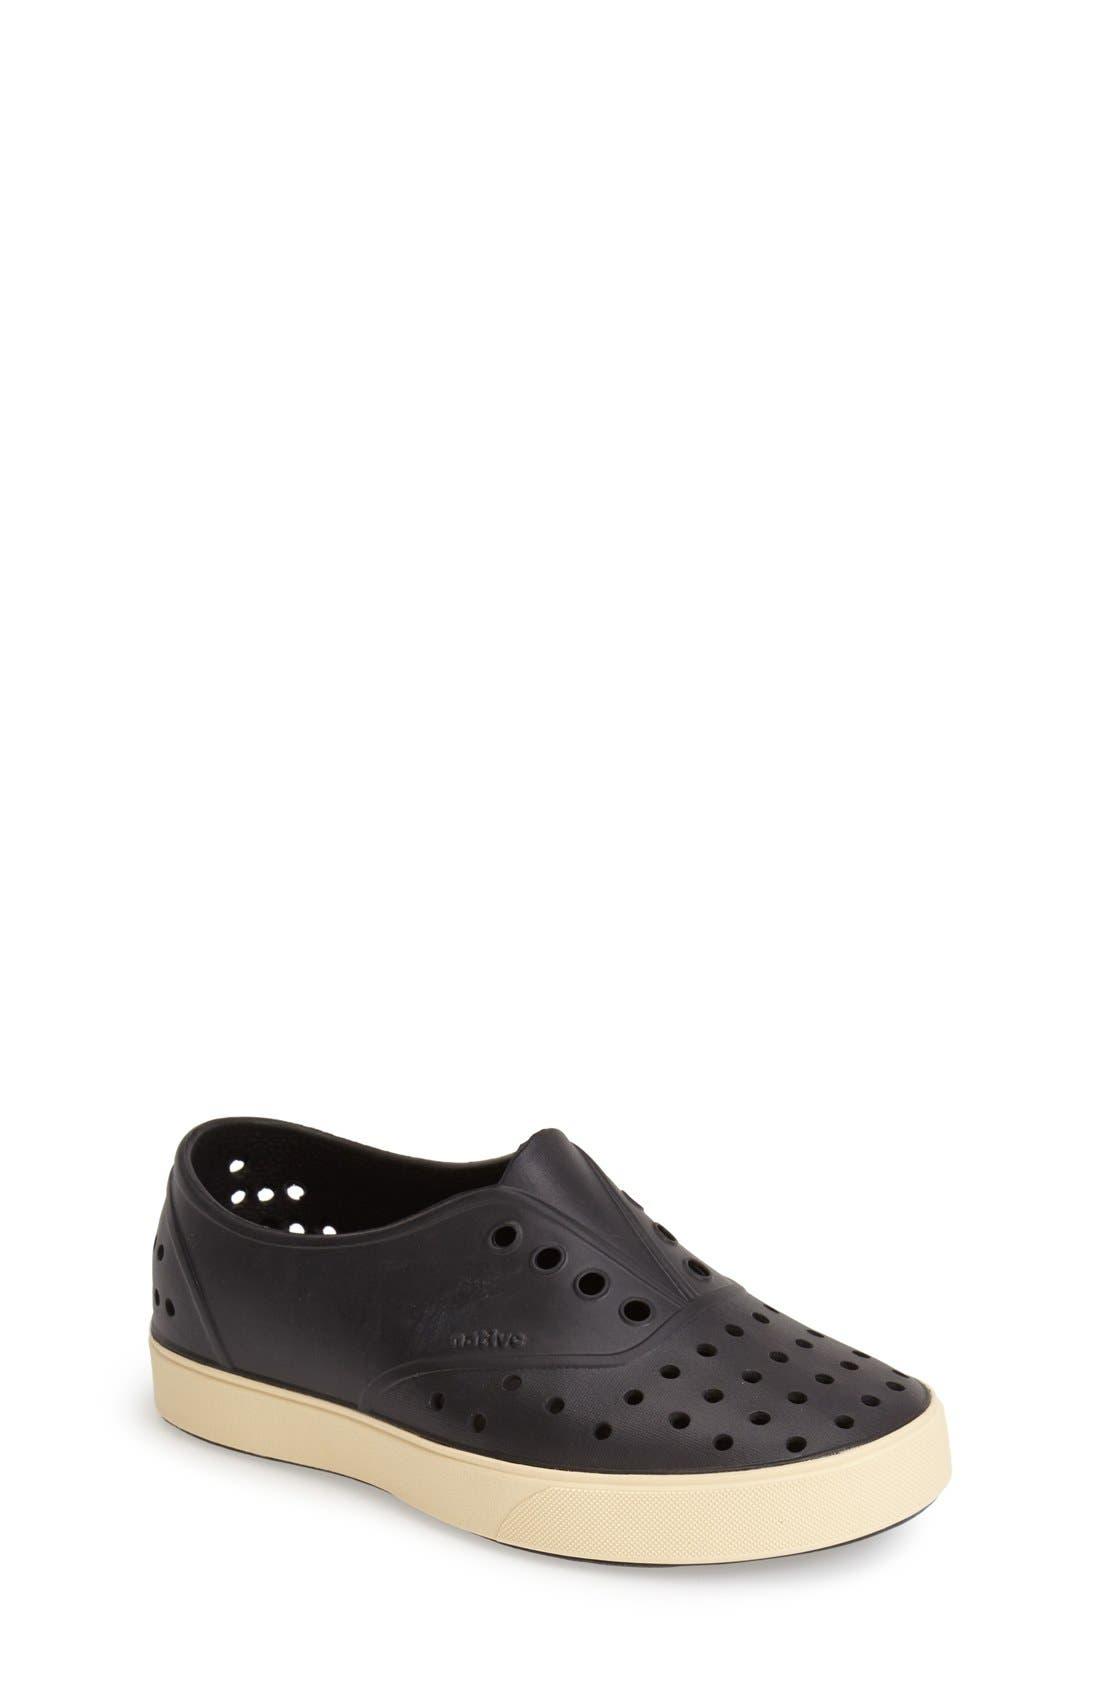 Alternate Image 1 Selected - Native Shoes Miller Slip-On Sneaker (Walker, Toddler & Little Kid)